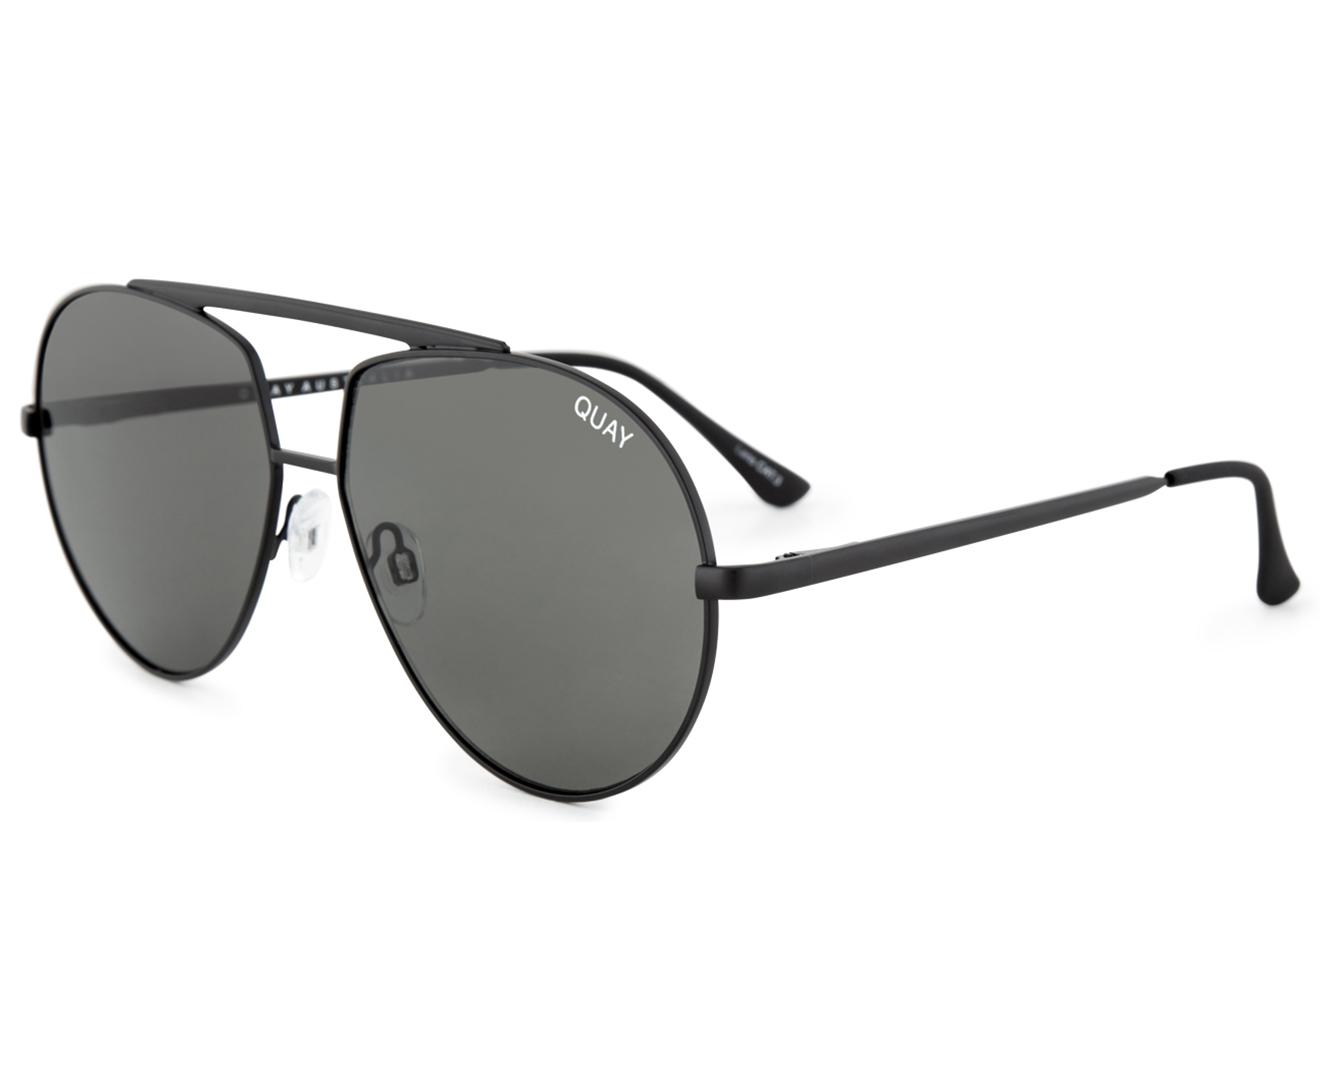 ac3c051b67 Quay Australia Men s Blaze Sunglasses - Black Green